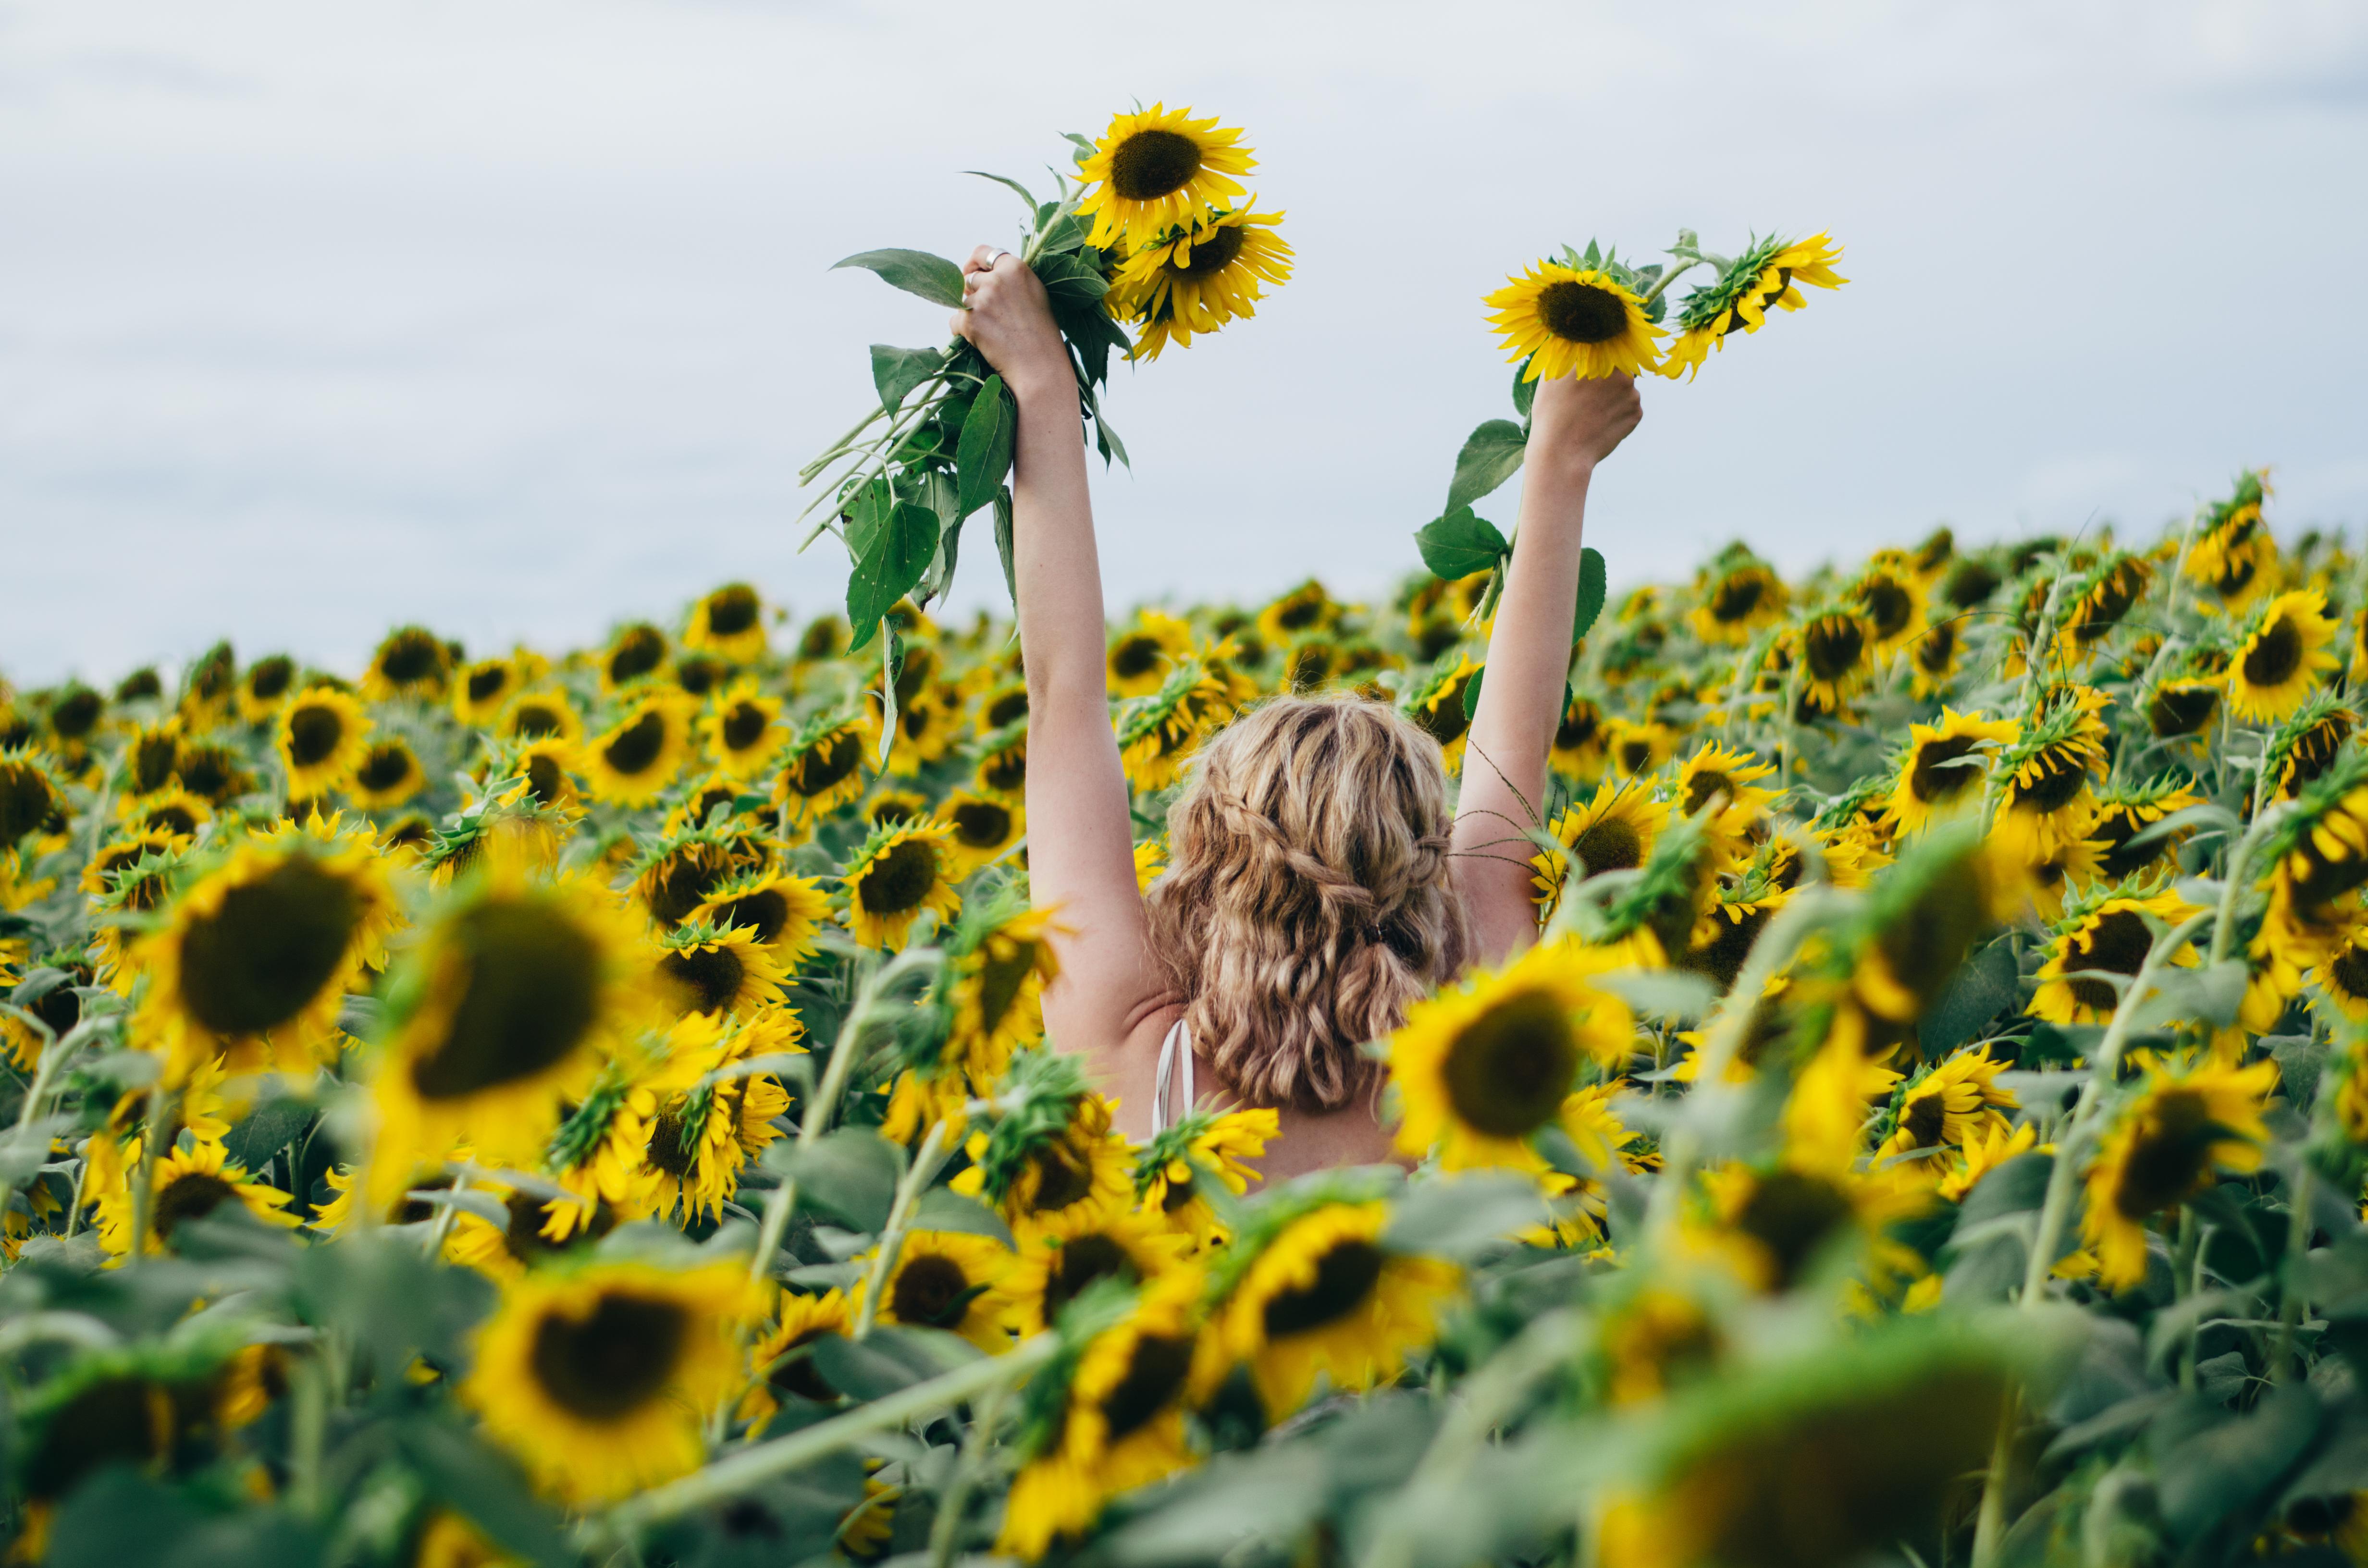 Sunflower Fields Forever | Juliette Laura